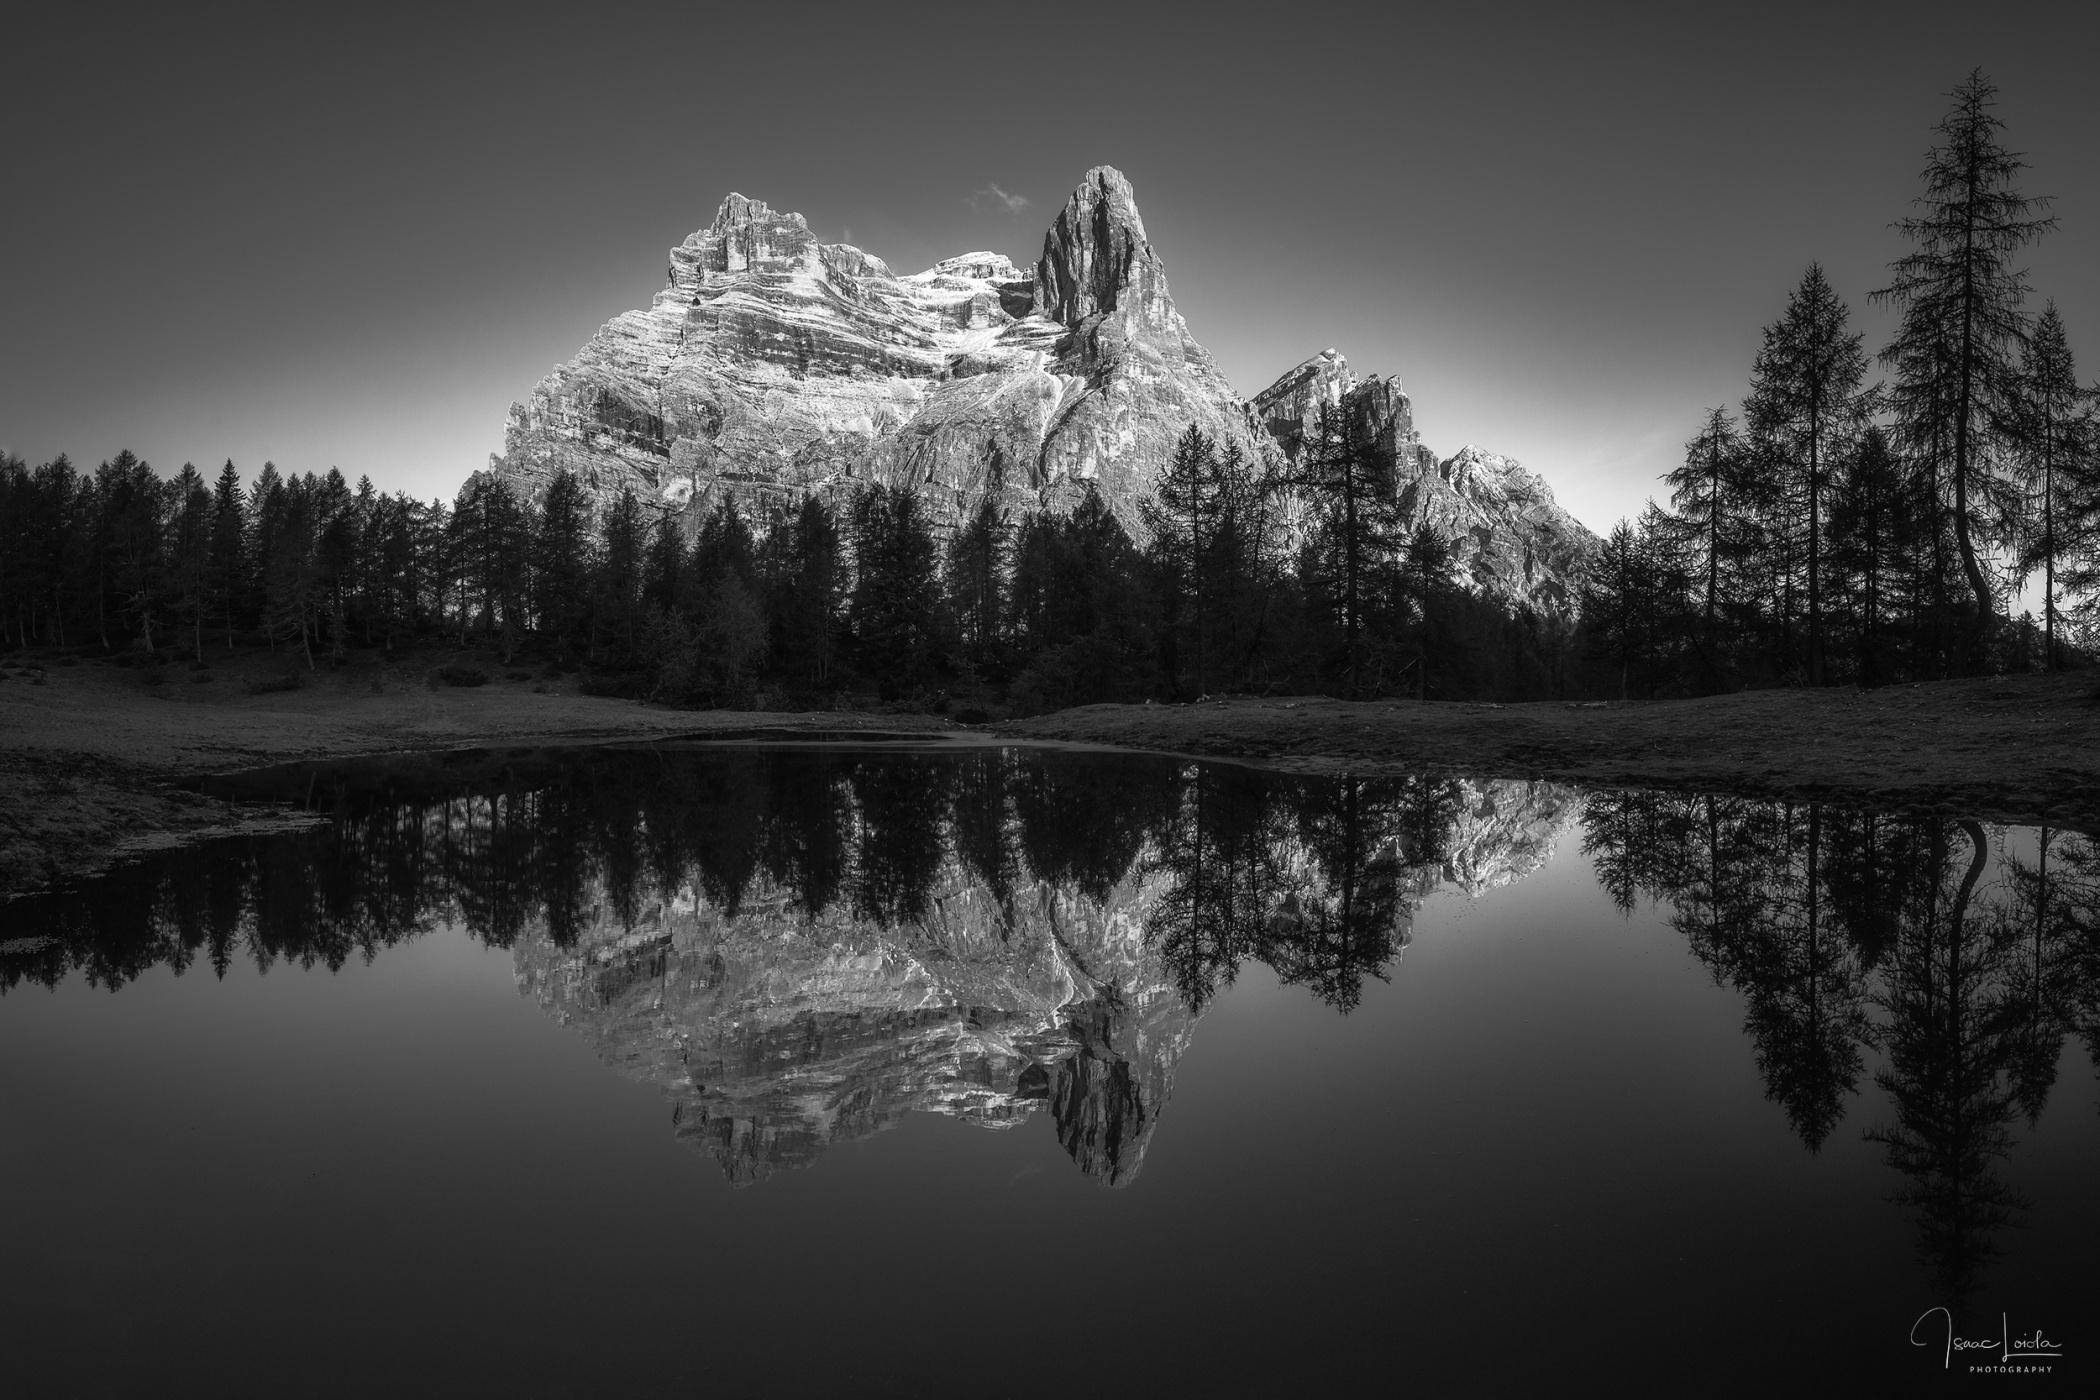 Monte Pelmo - Monochromo - Isaac Loiola, Photography